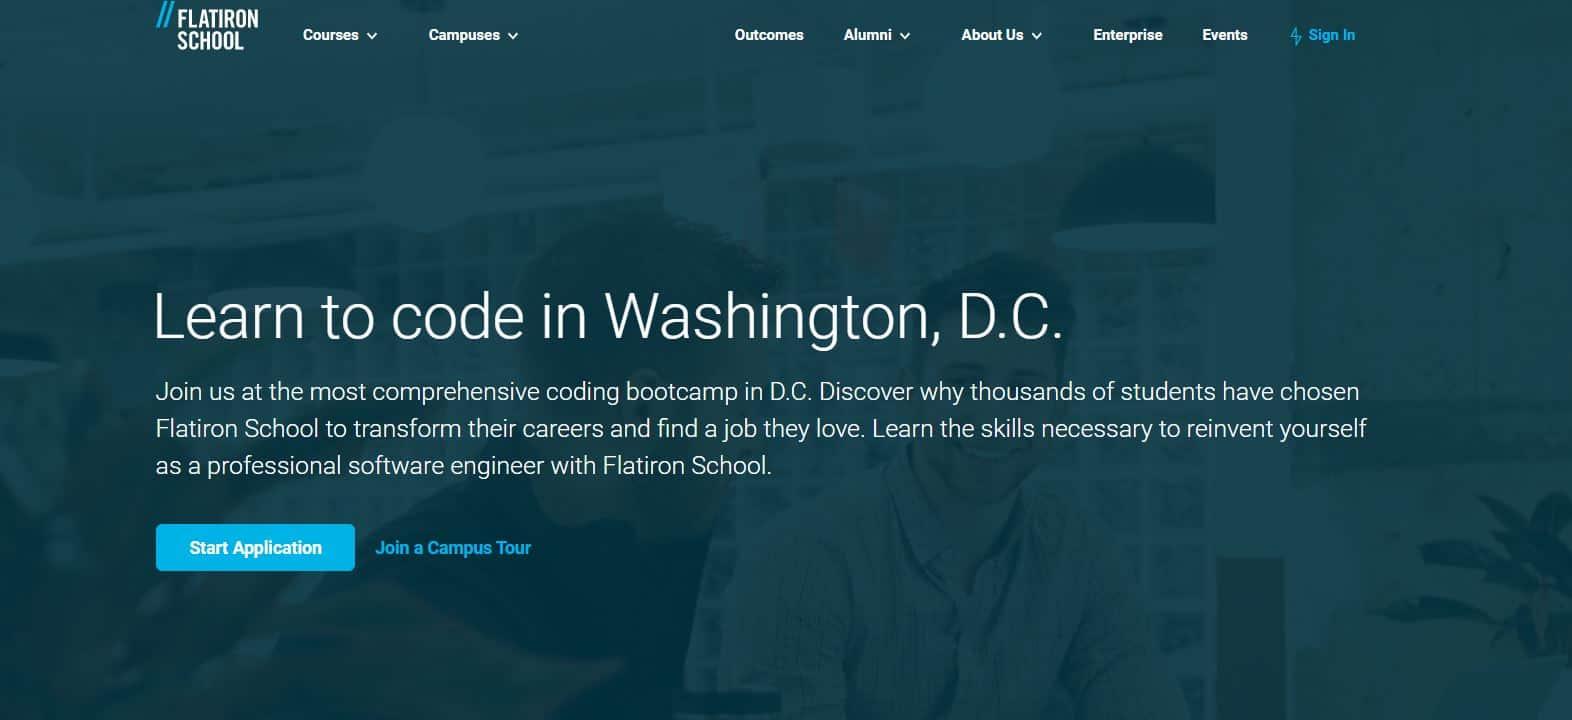 Flatiron School coding school review in DC